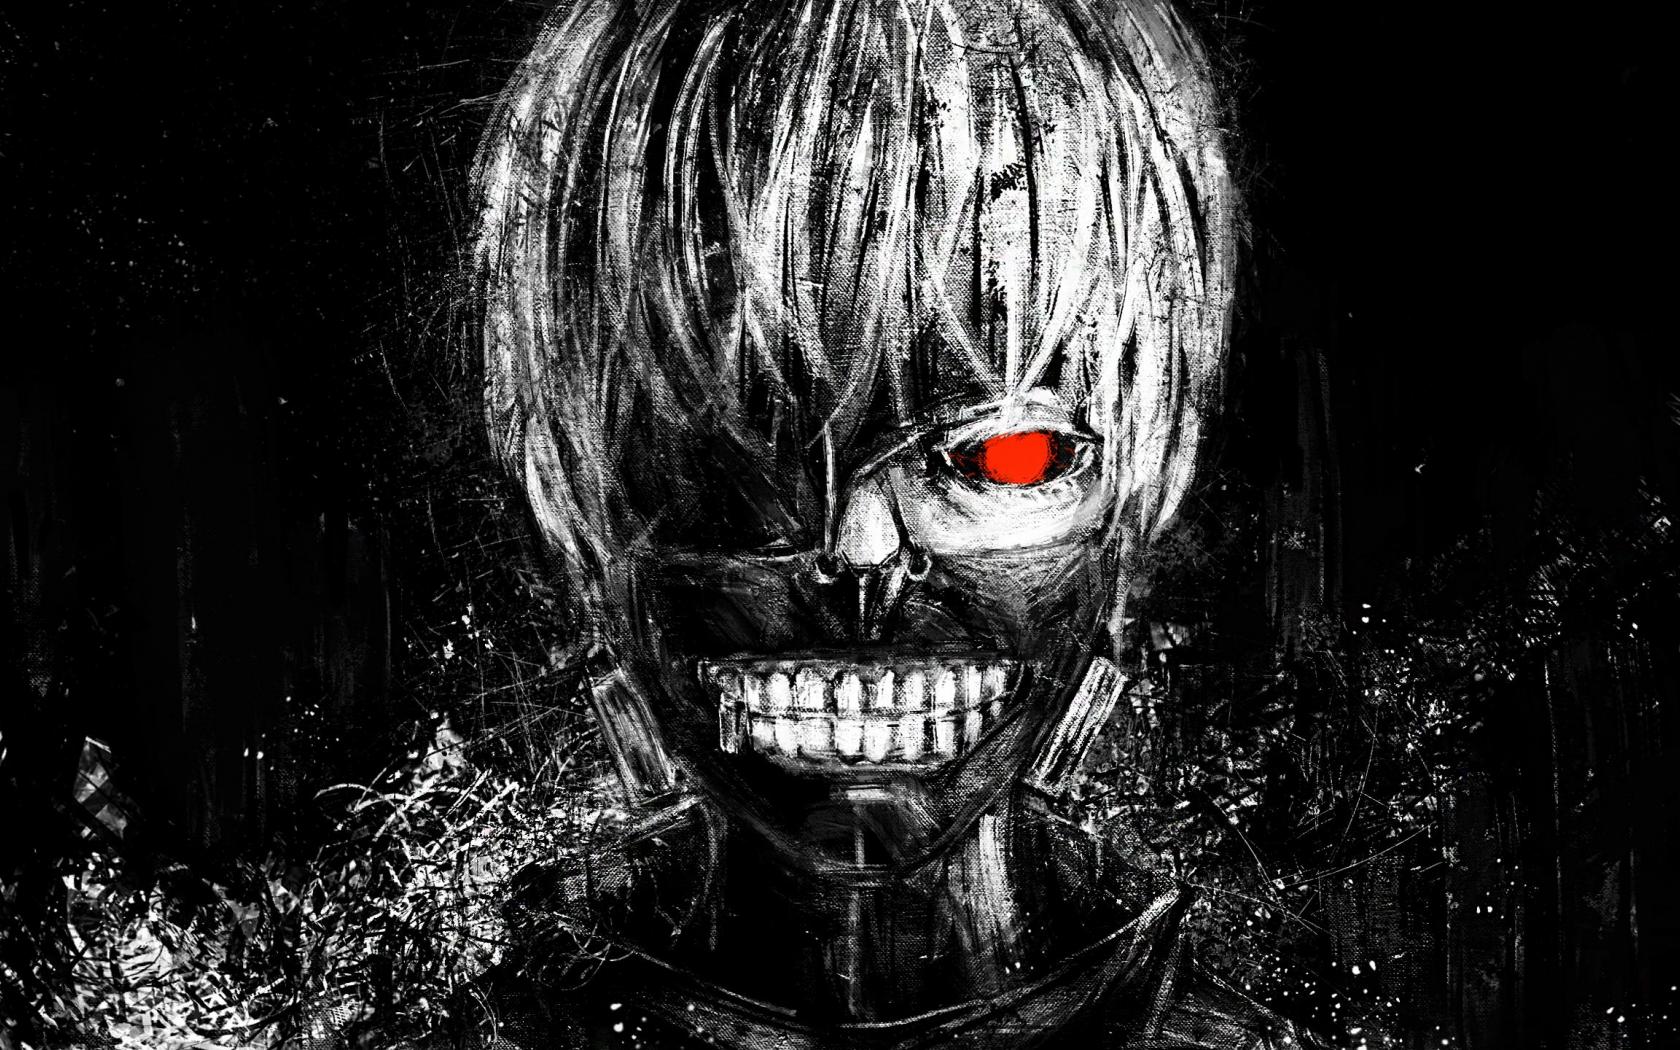 Free Download Tokyo Ghoul Wallpaper 16 2560 X 1440 Stmednet